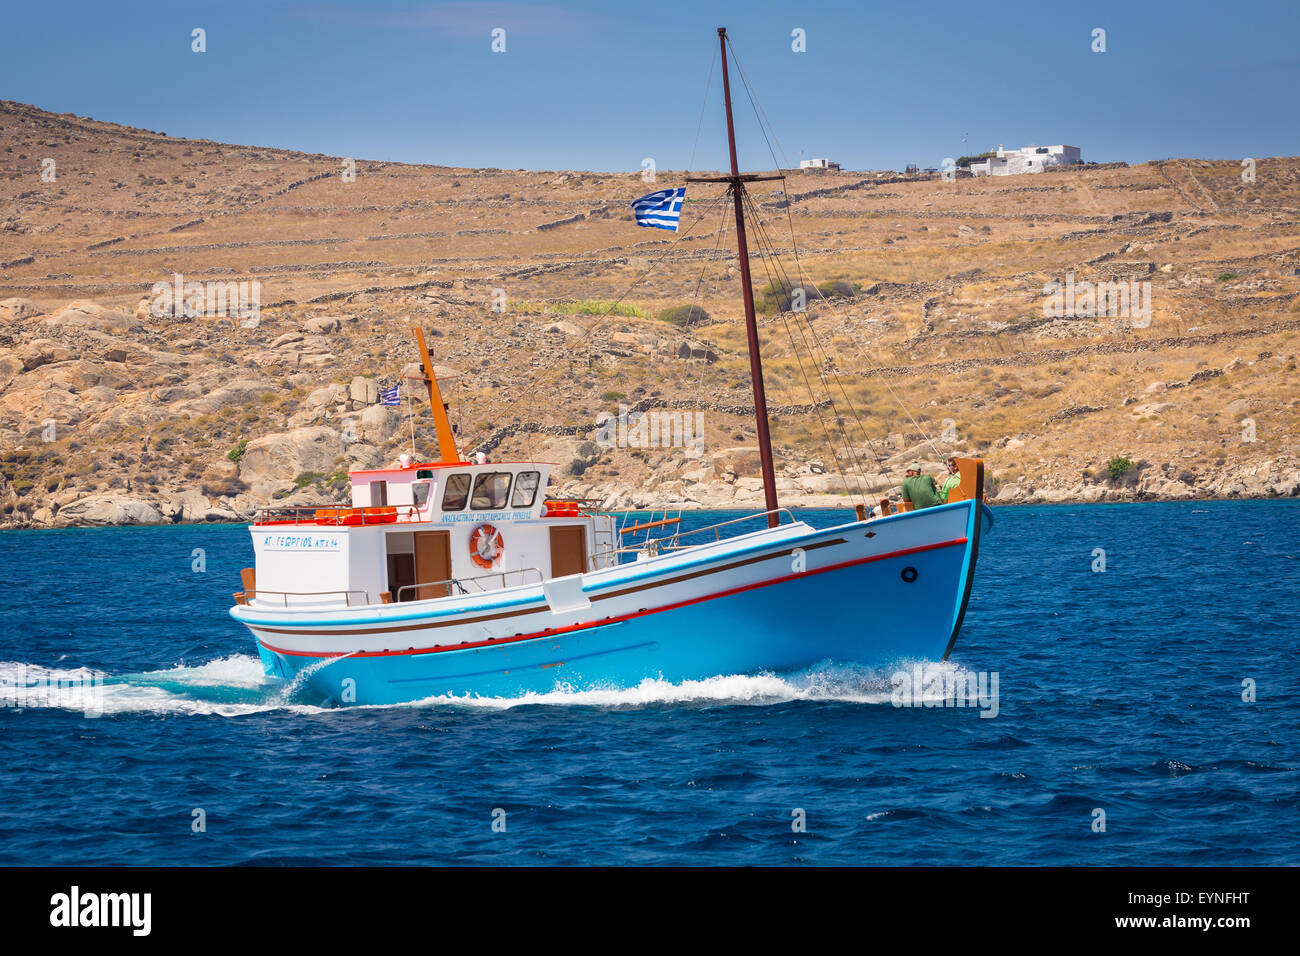 Griechische Boot in der Ägäis nahe der Insel Delos Stockbild